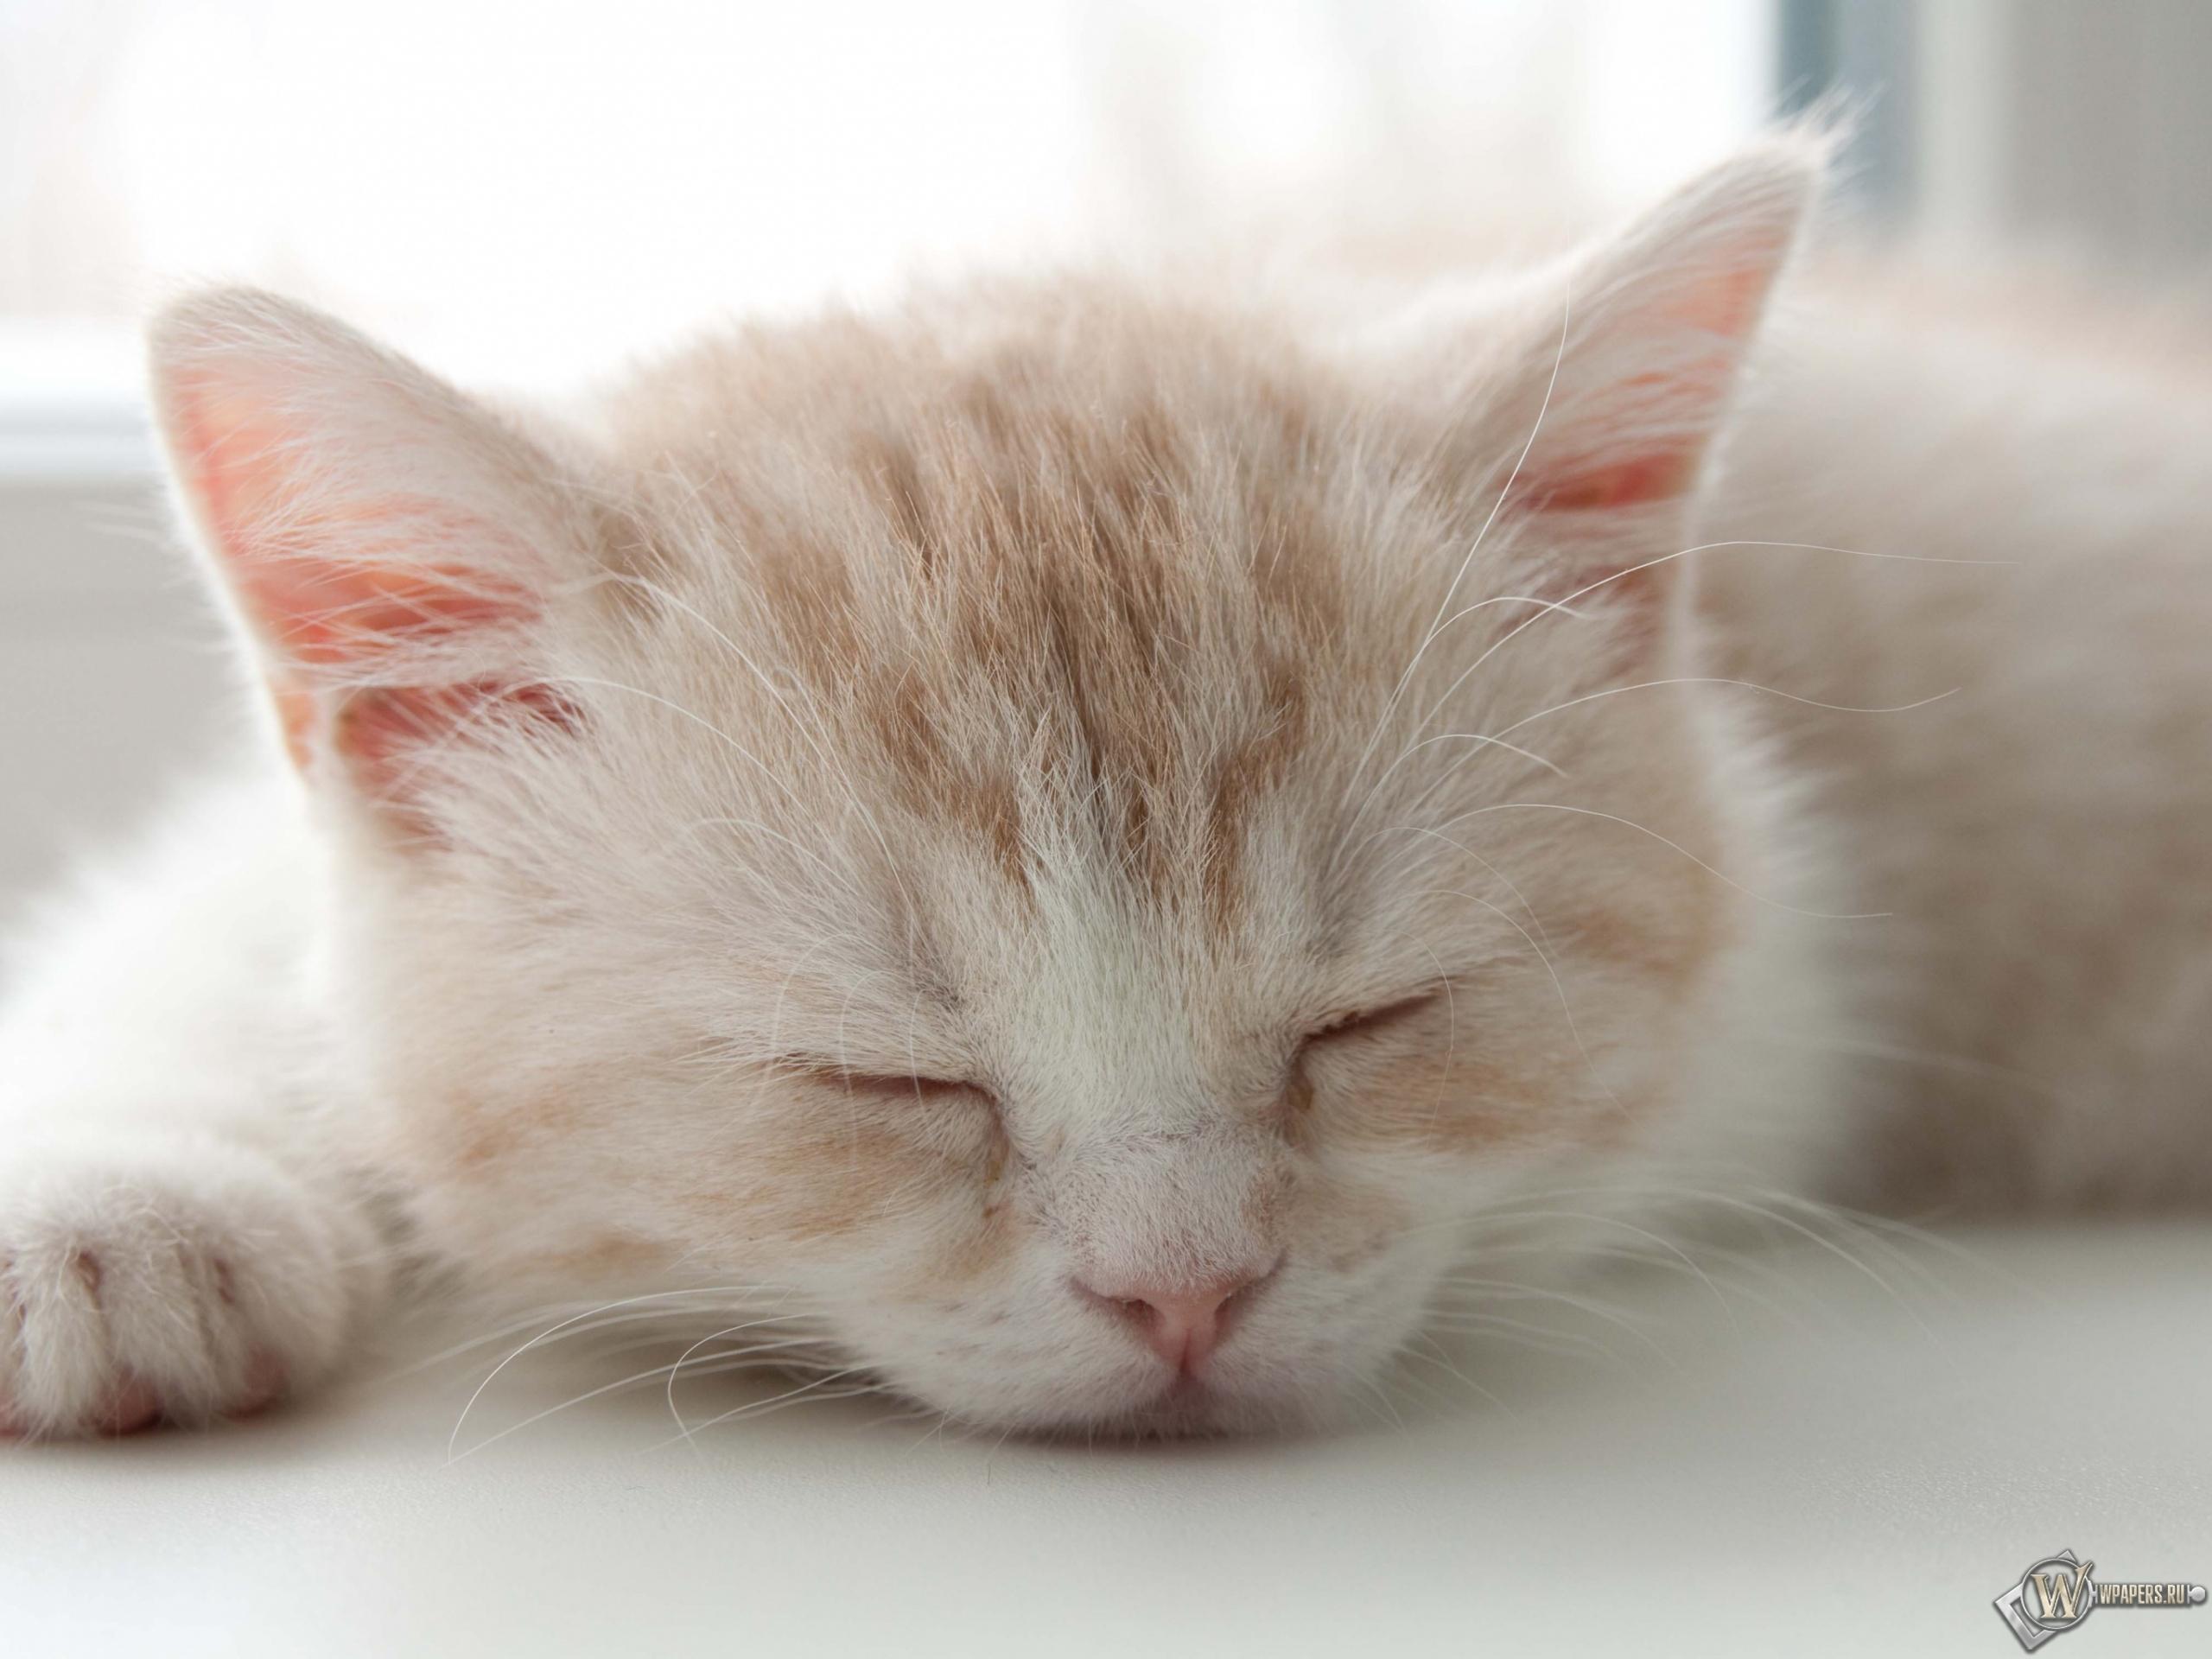 Котёнок спит 2560x1920